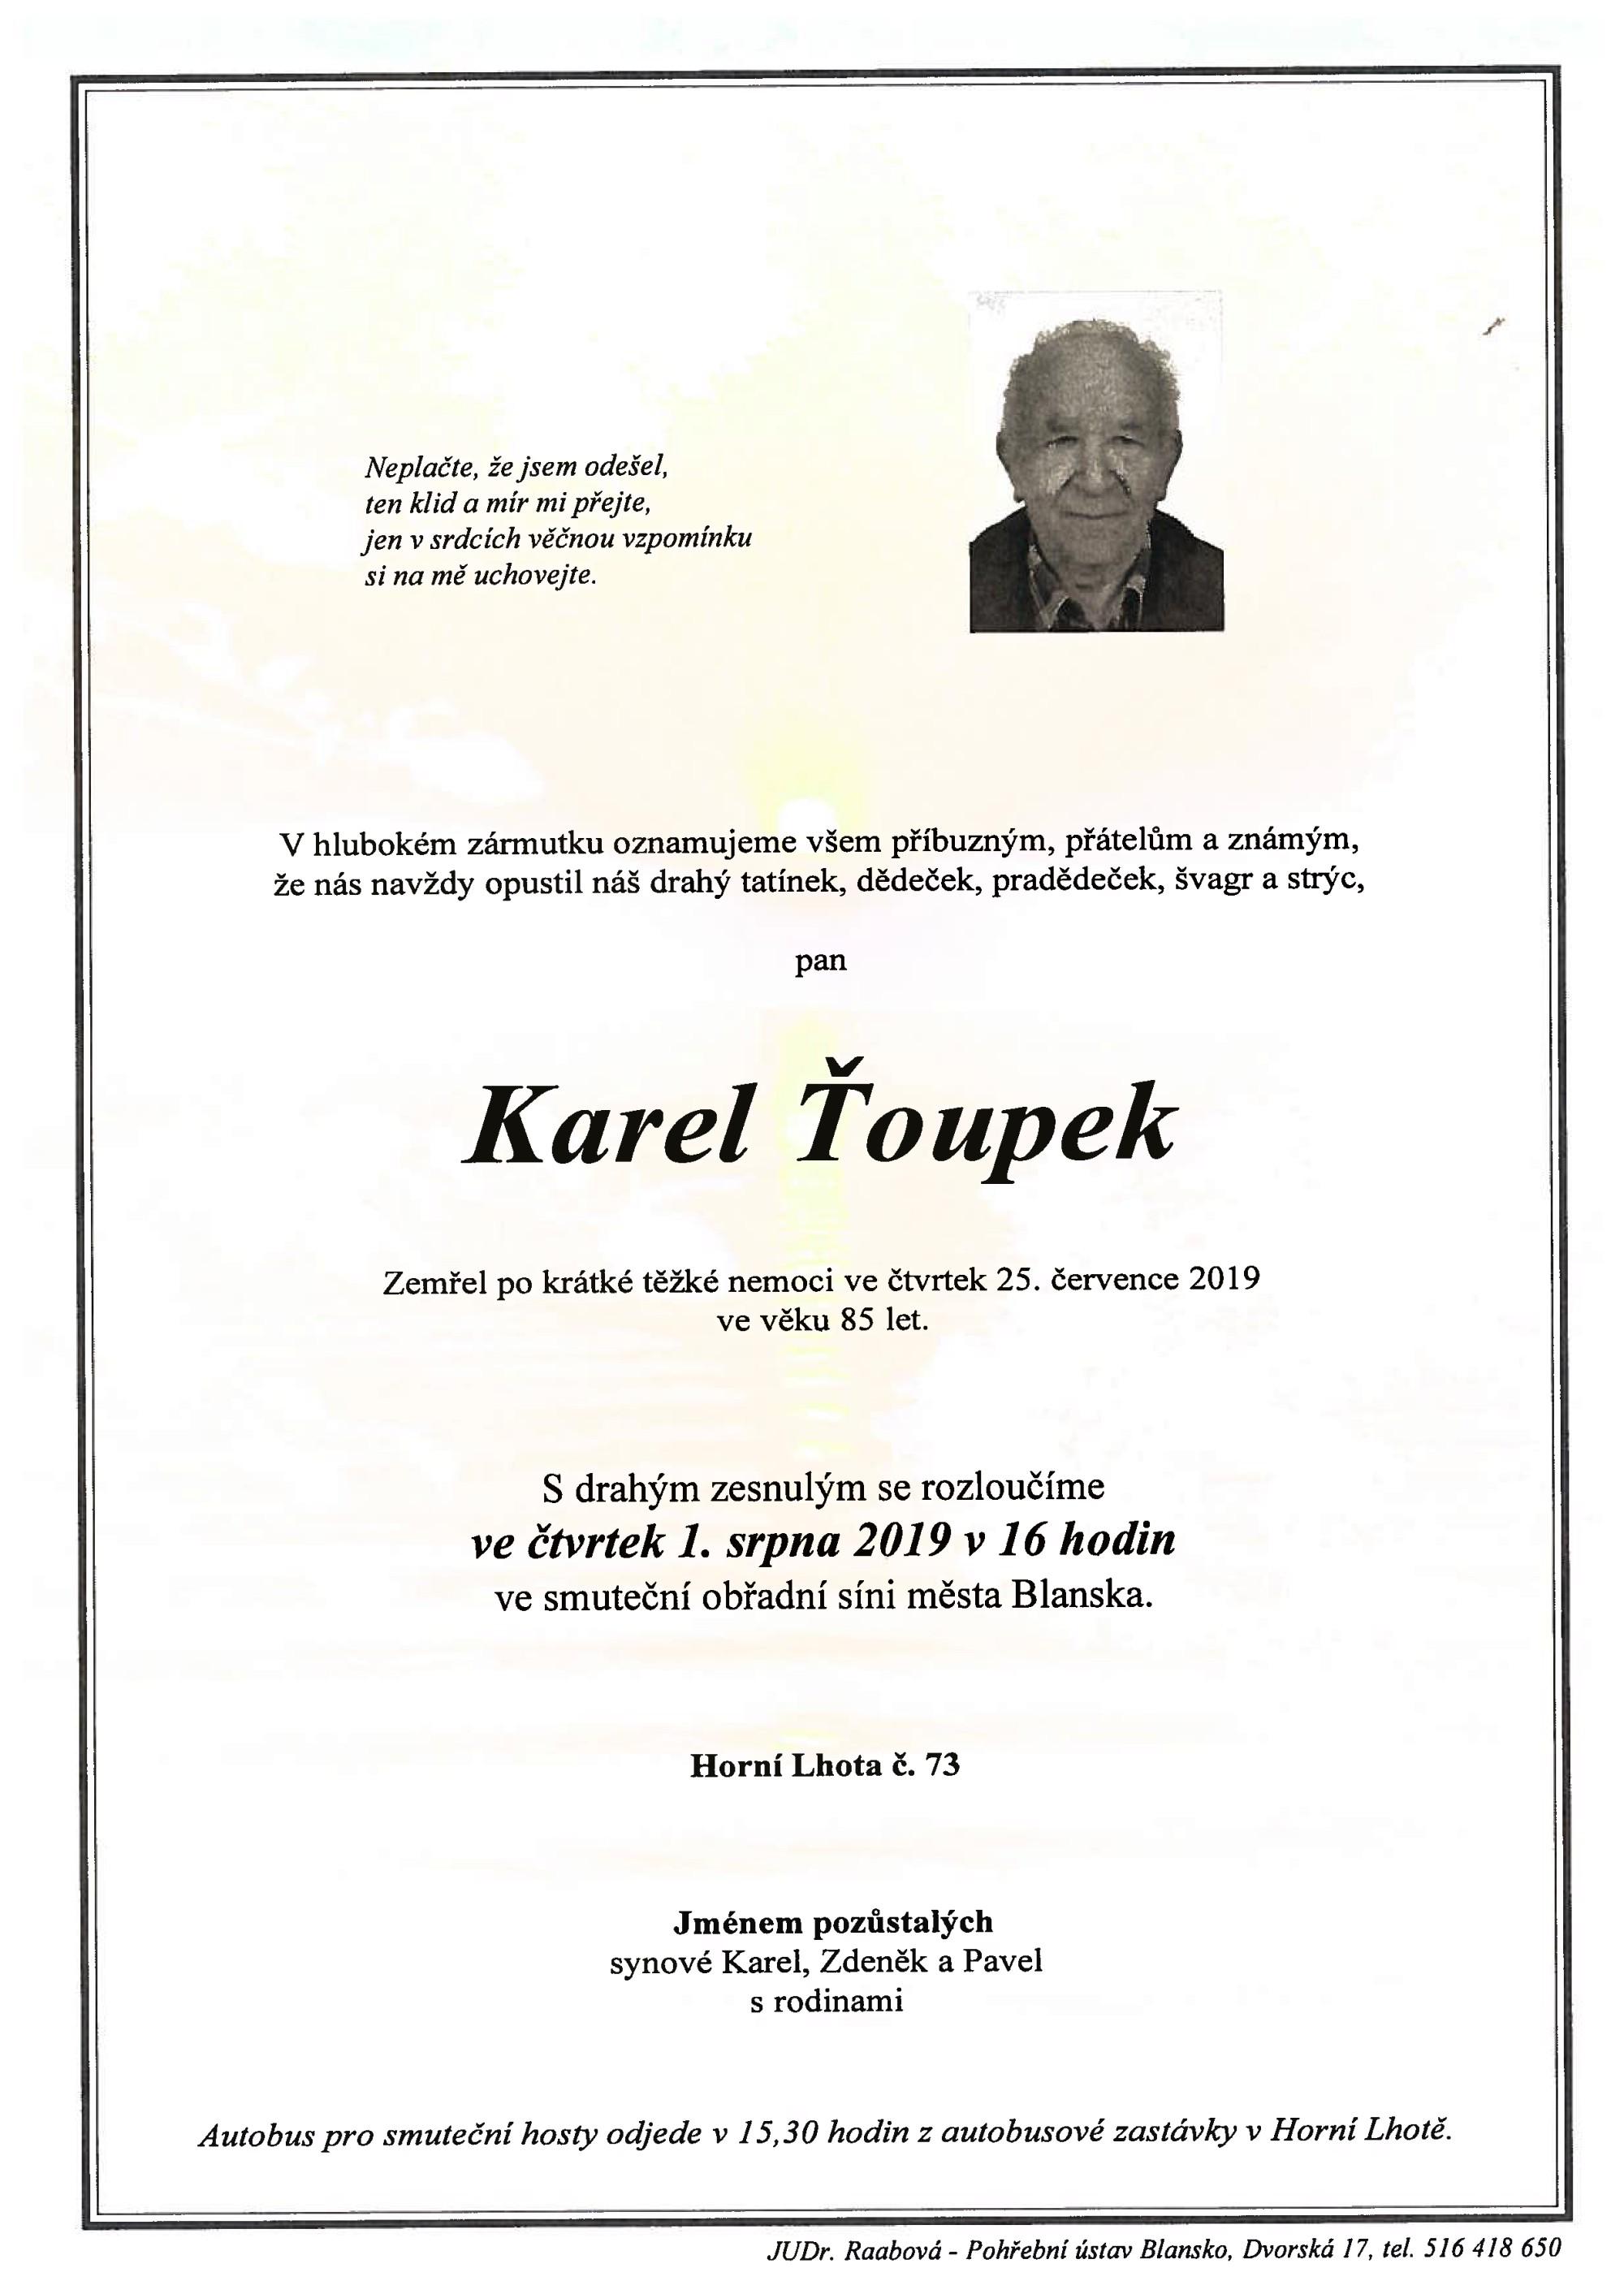 Karel Ťoupek